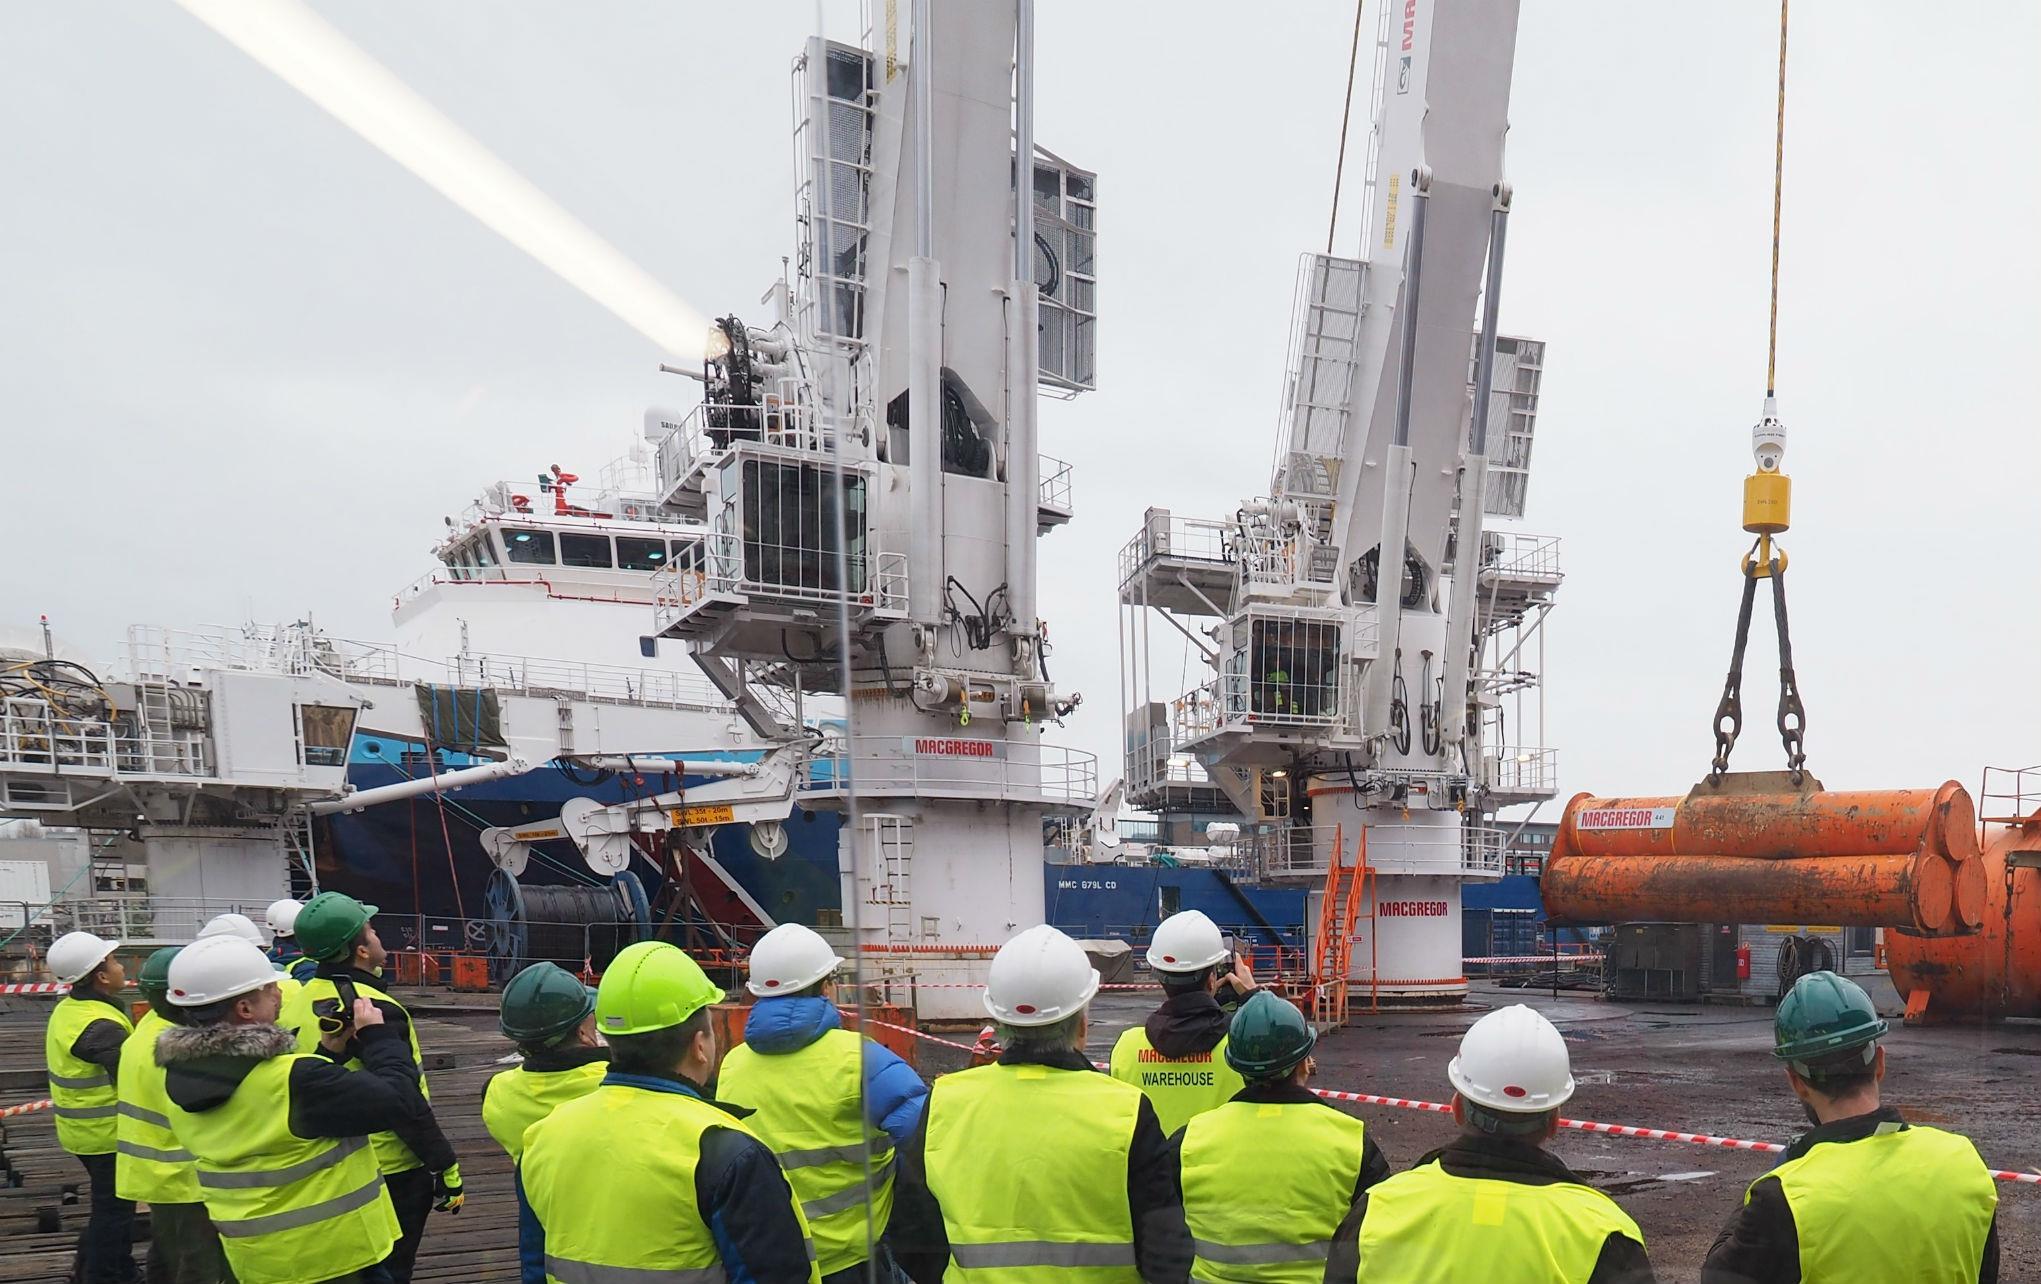 A FibreTrac crane at a recent customer demonstration inKristiansand, Norway. Photo credit: MacGregor.